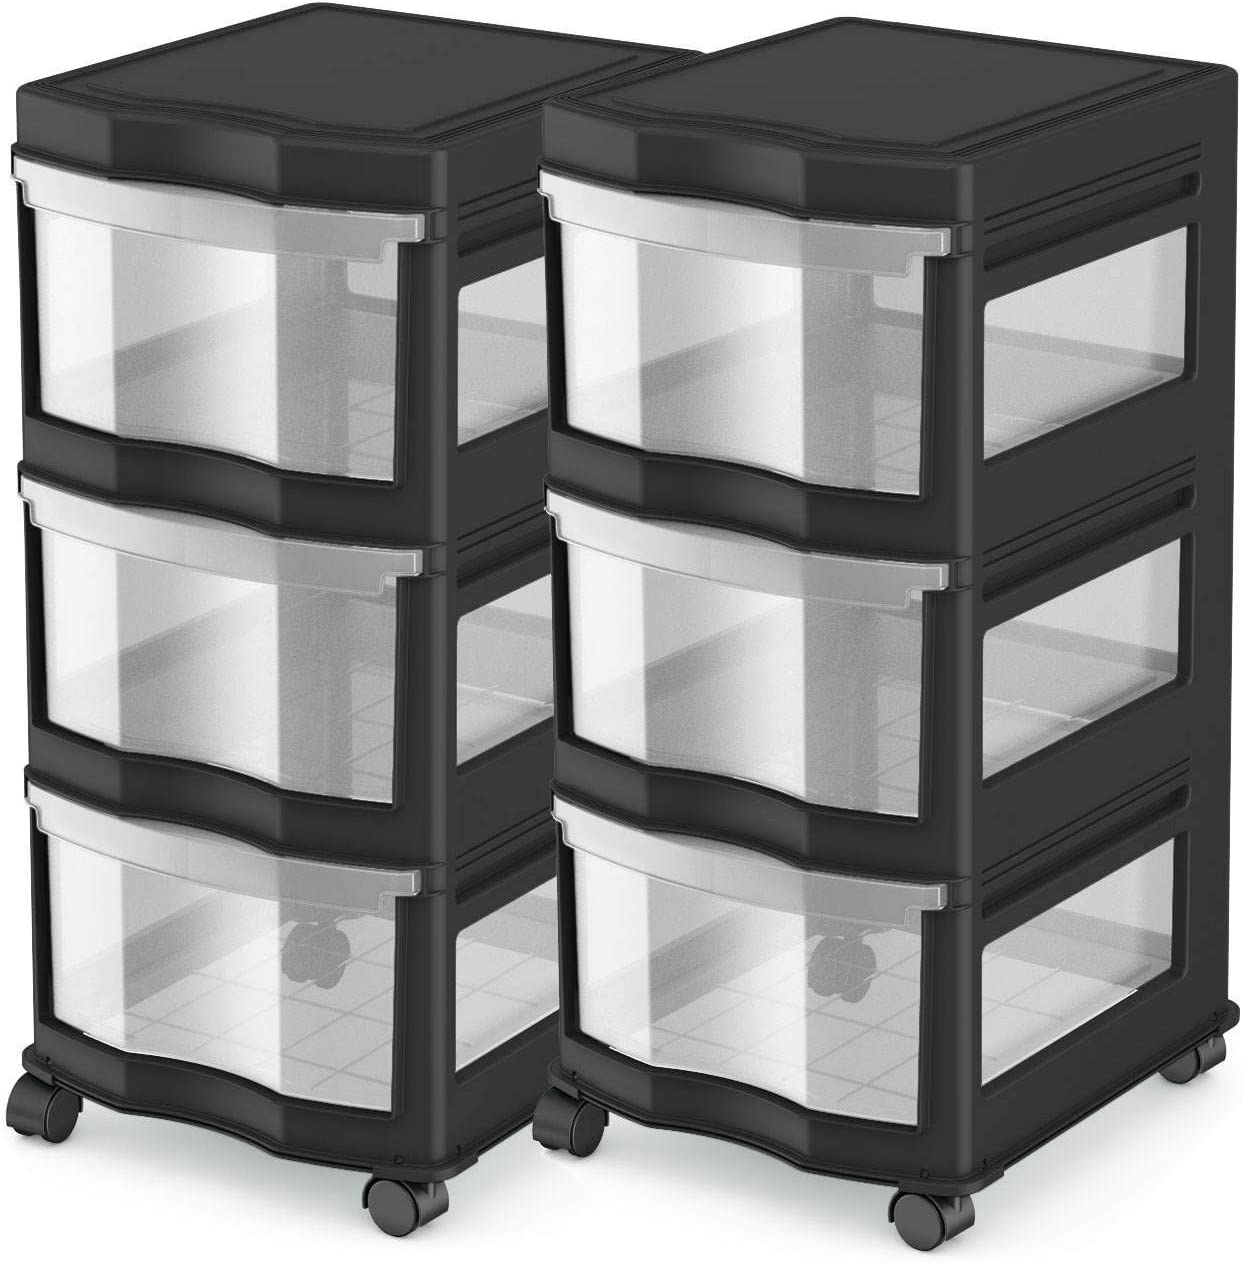 Life Story Classic 3 Shelf Storage Drawers Max 52% OFF Organizer Bl Plastic Regular store